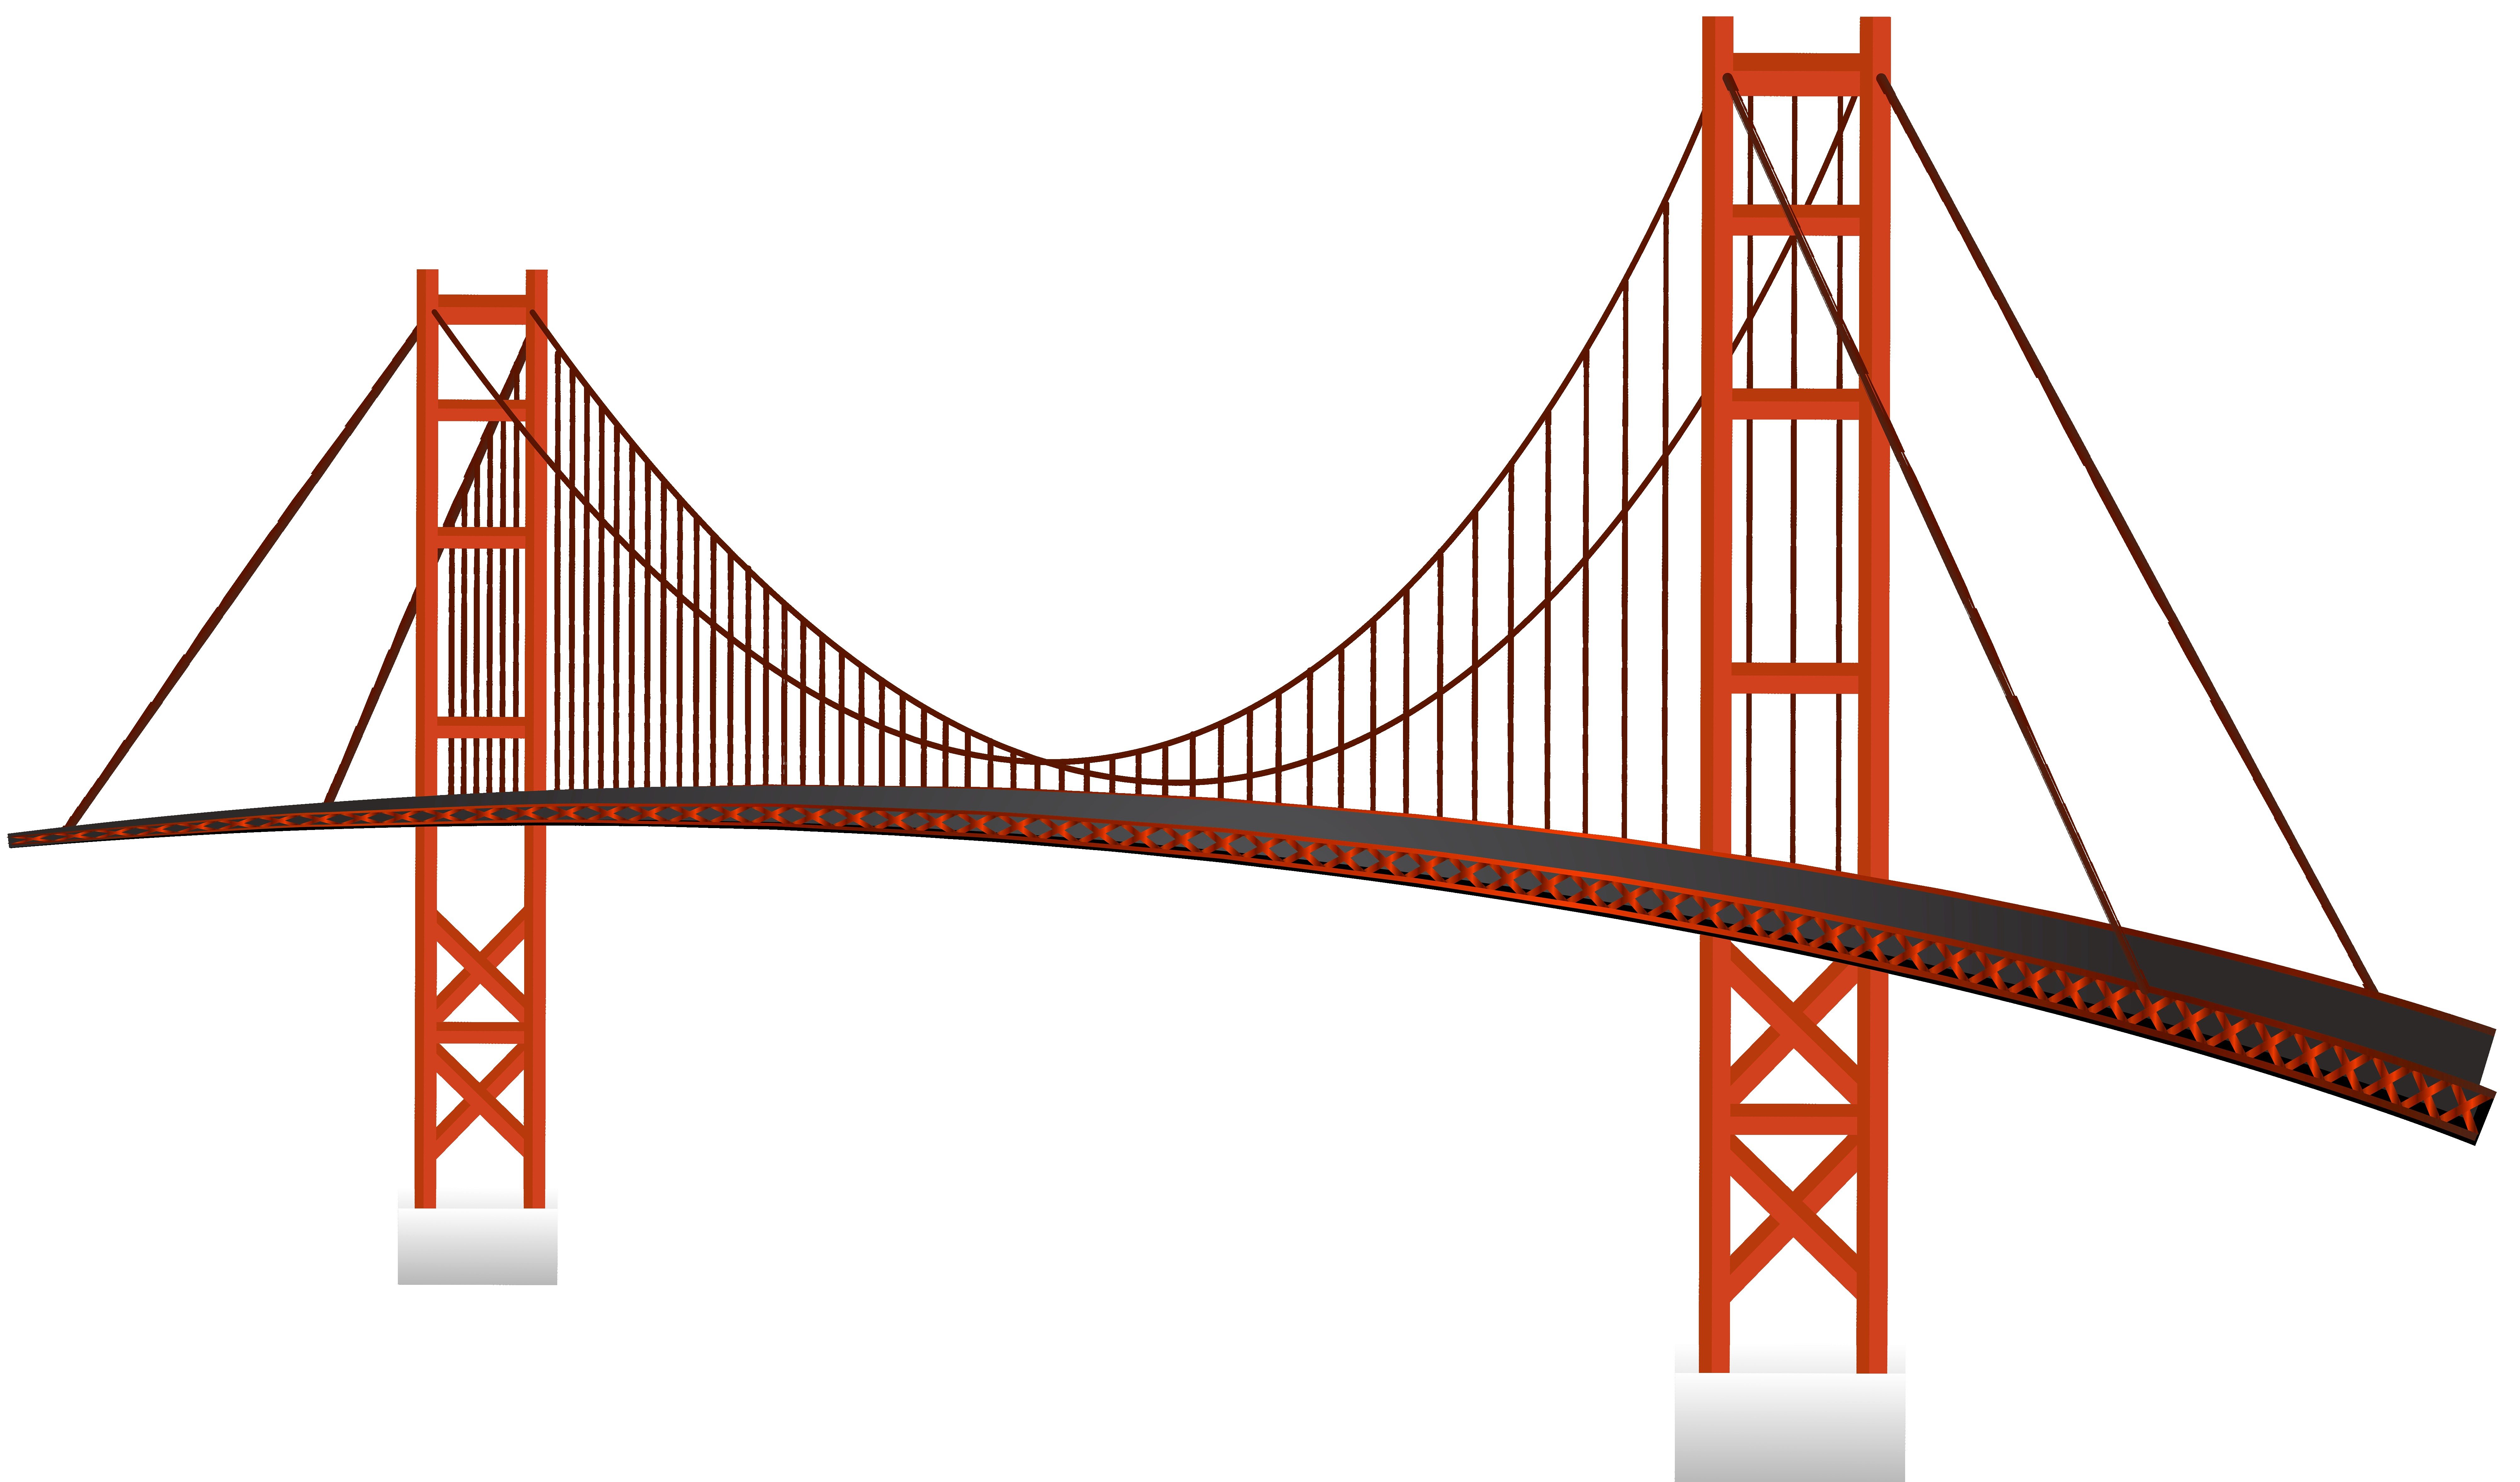 8000x4705 Golden Gate Bridge Vector Image Picturesque Clipart 17